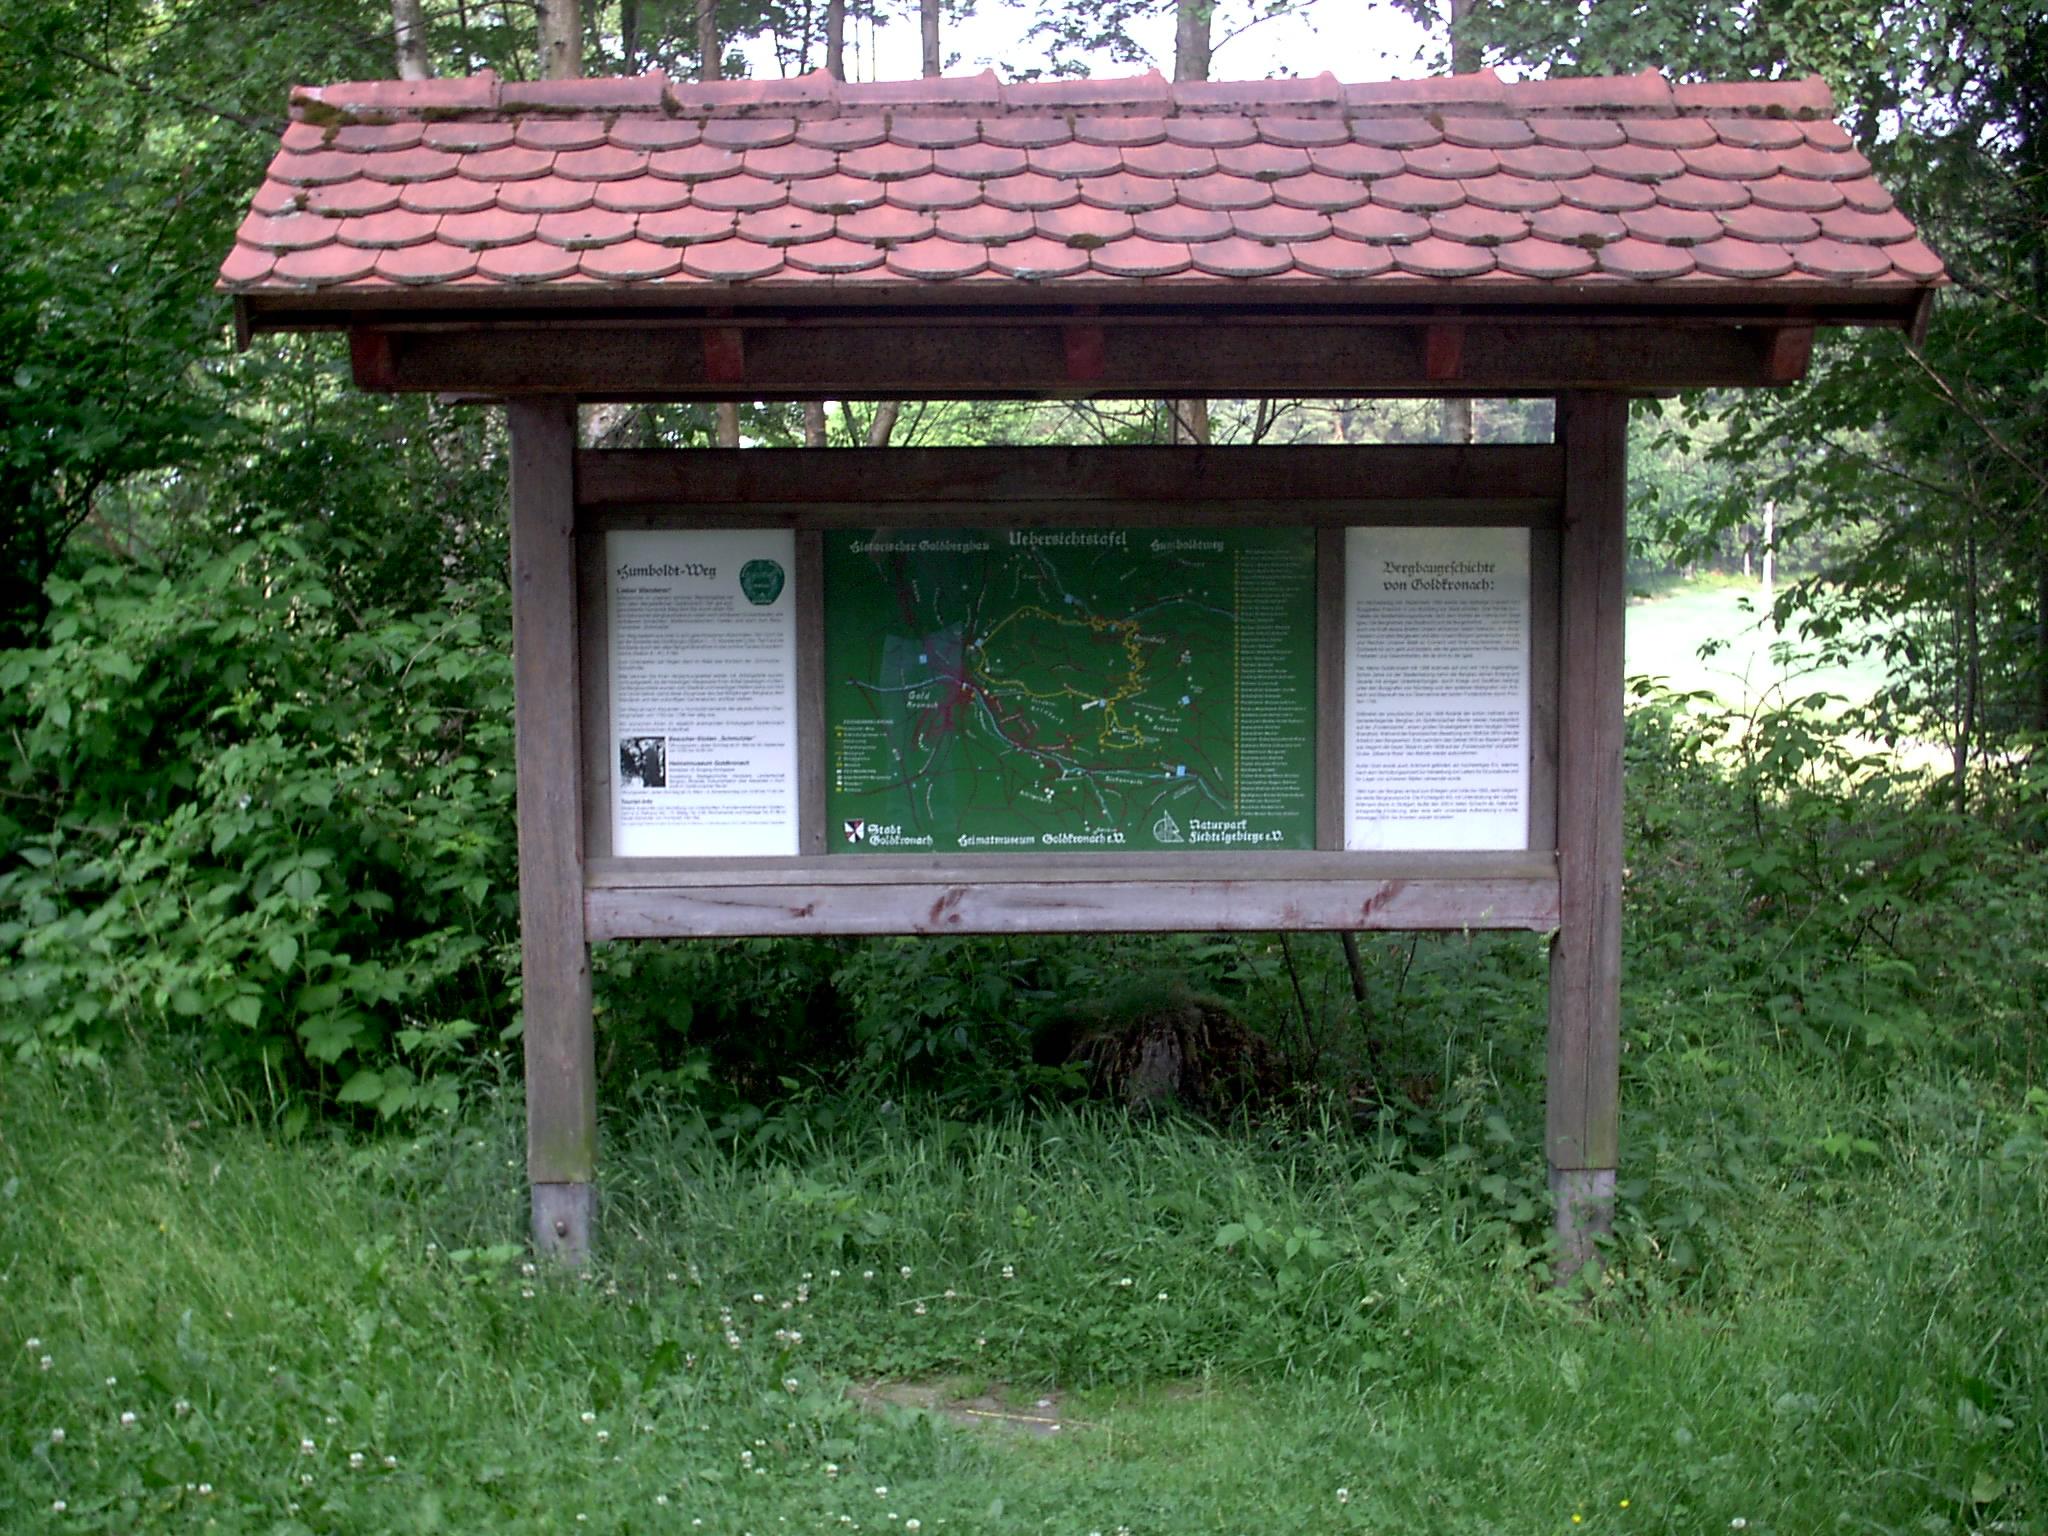 Humboldtweg 1